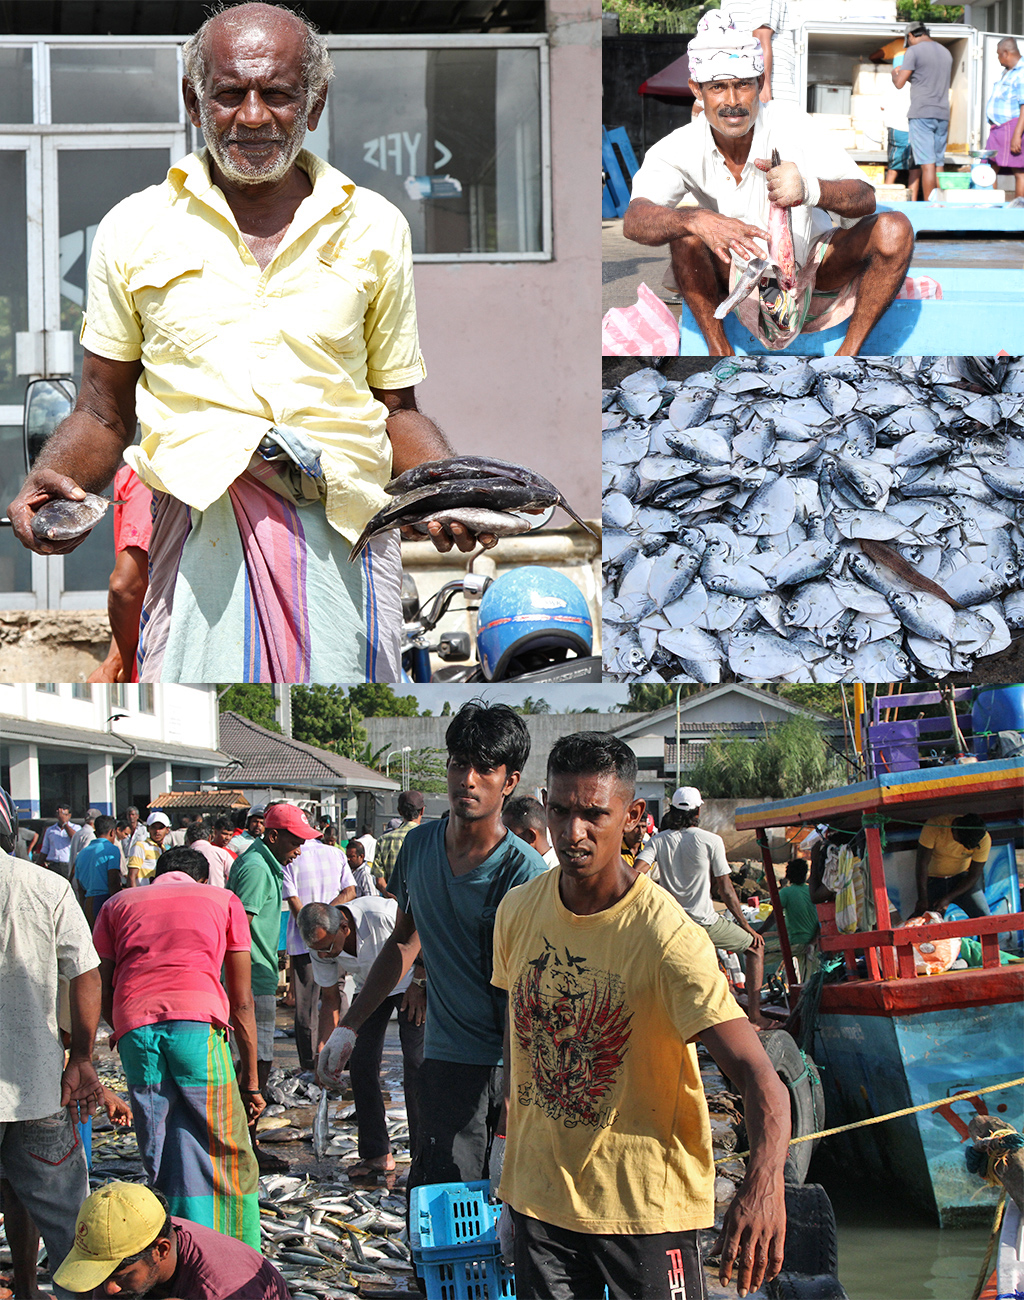 vissershaven Tangalle vissers